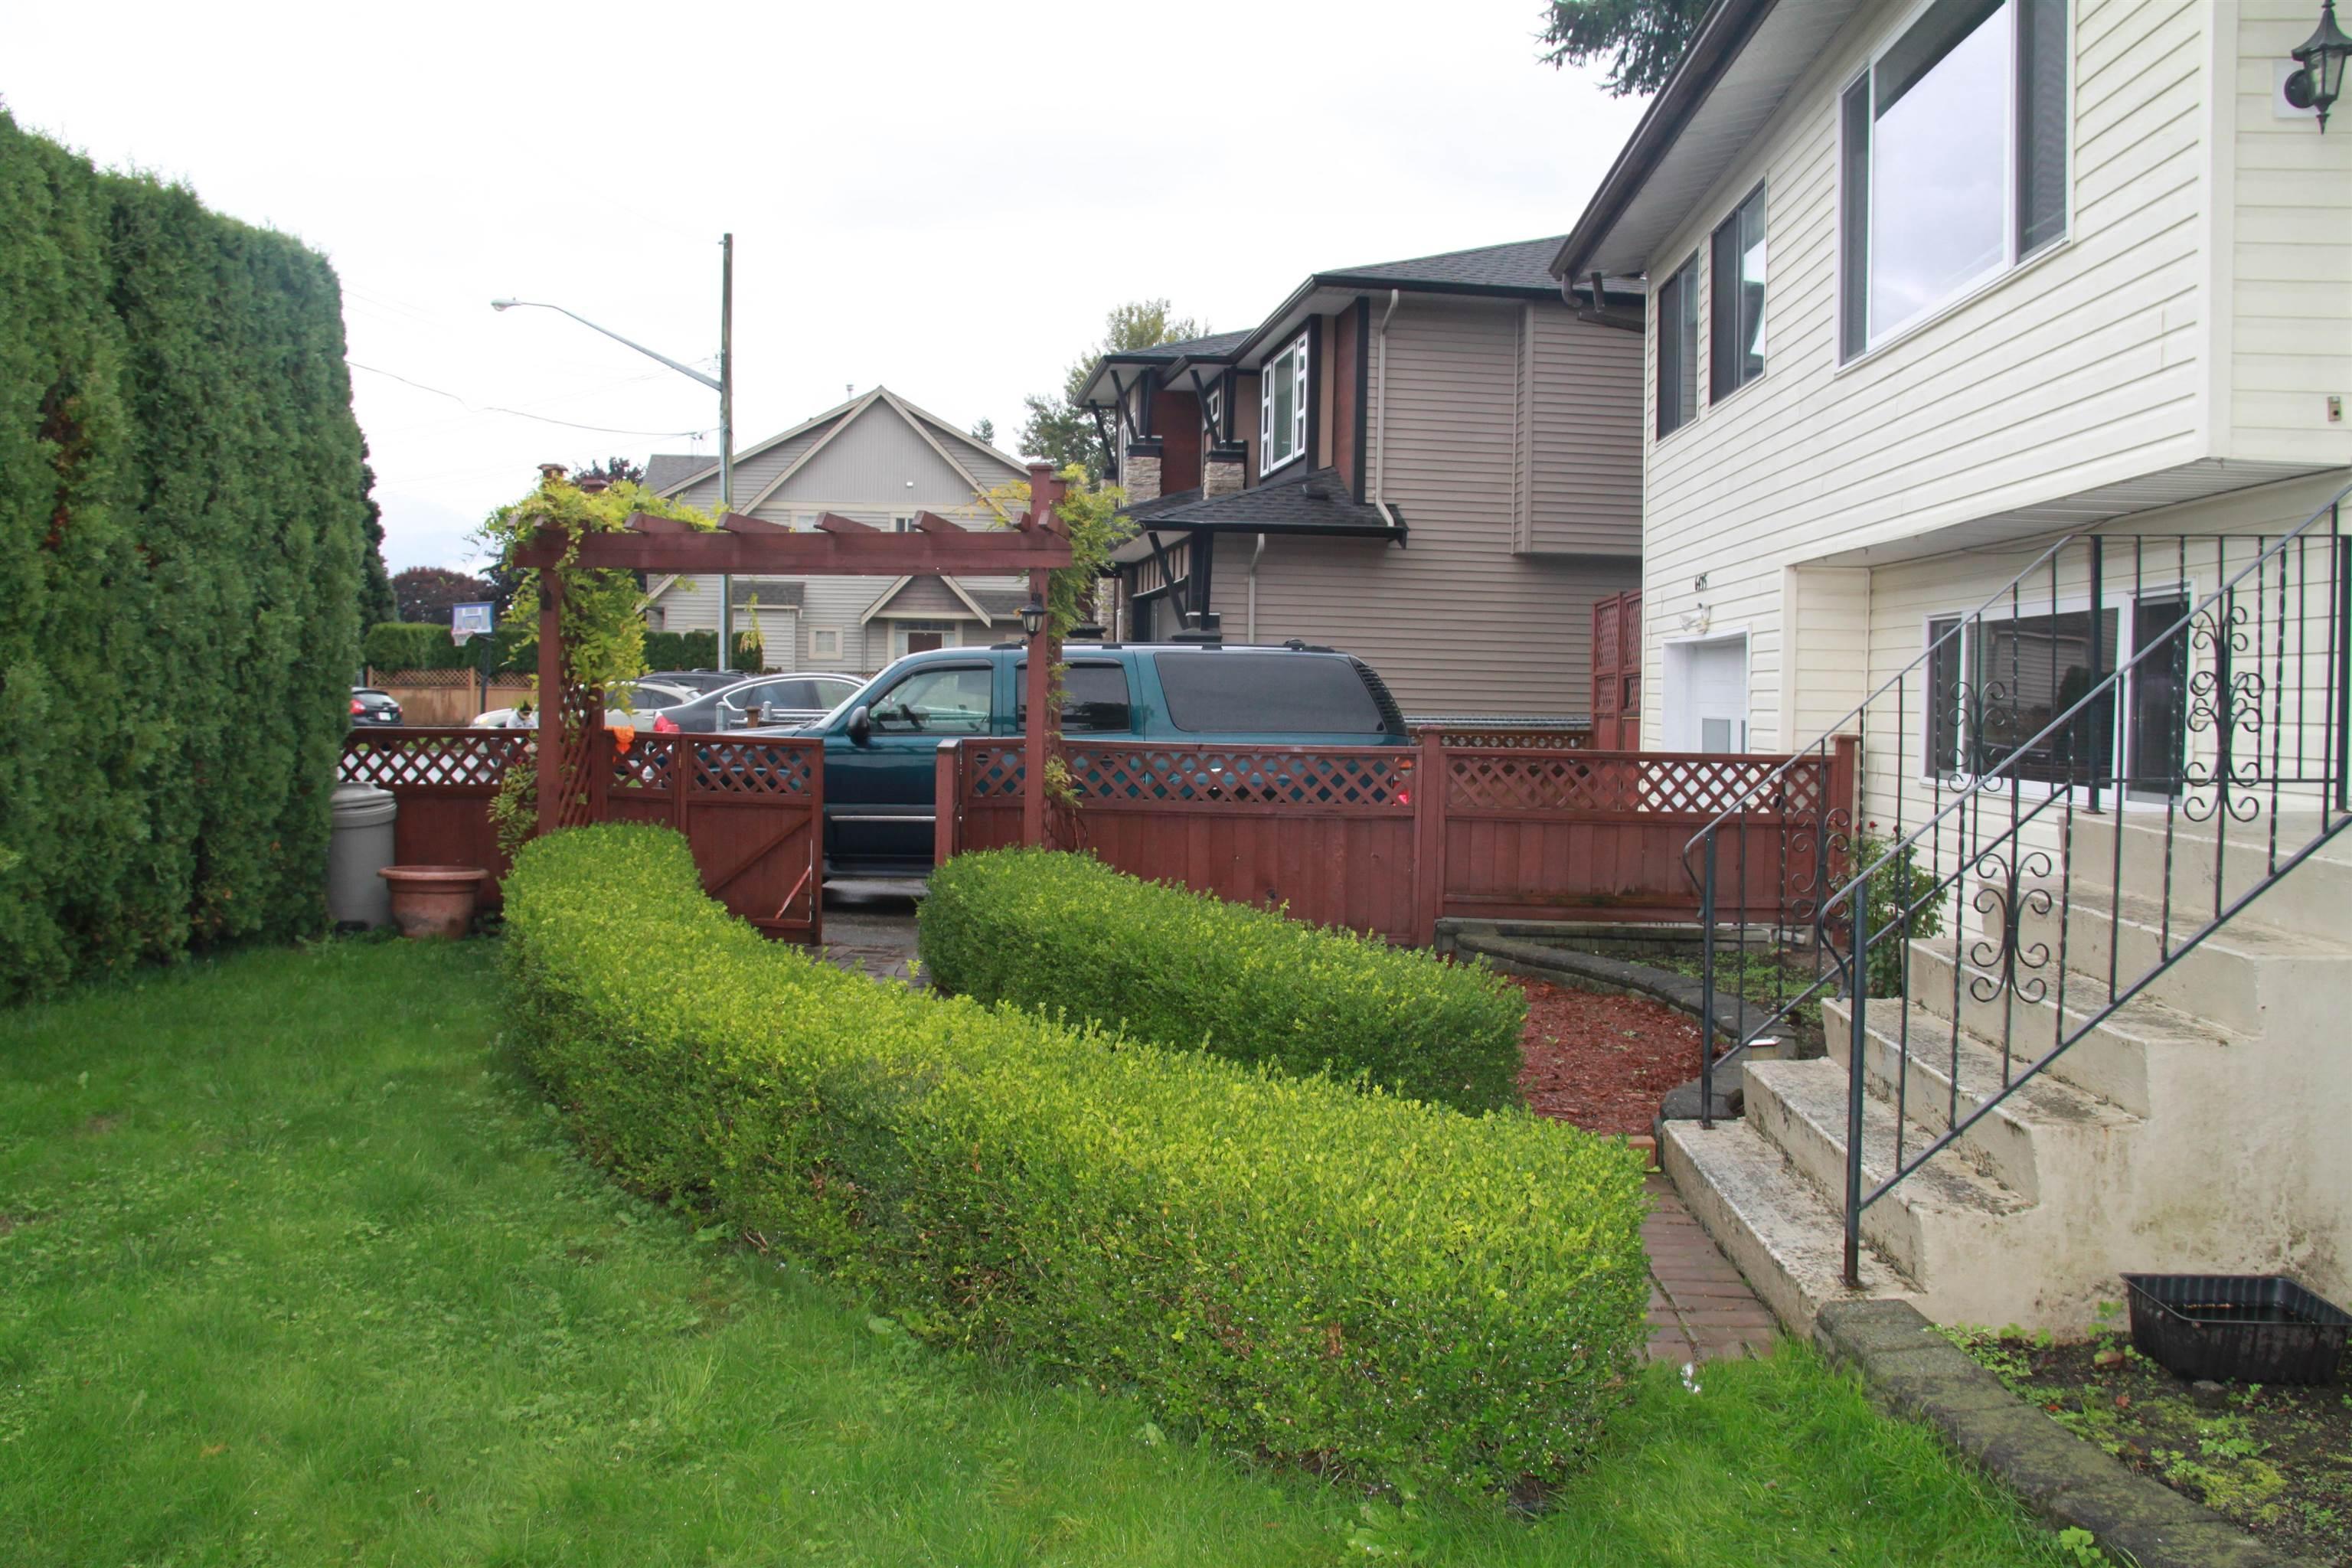 6435 FERN STREET - Sardis West Vedder Rd House/Single Family for sale, 5 Bedrooms (R2626889) - #1